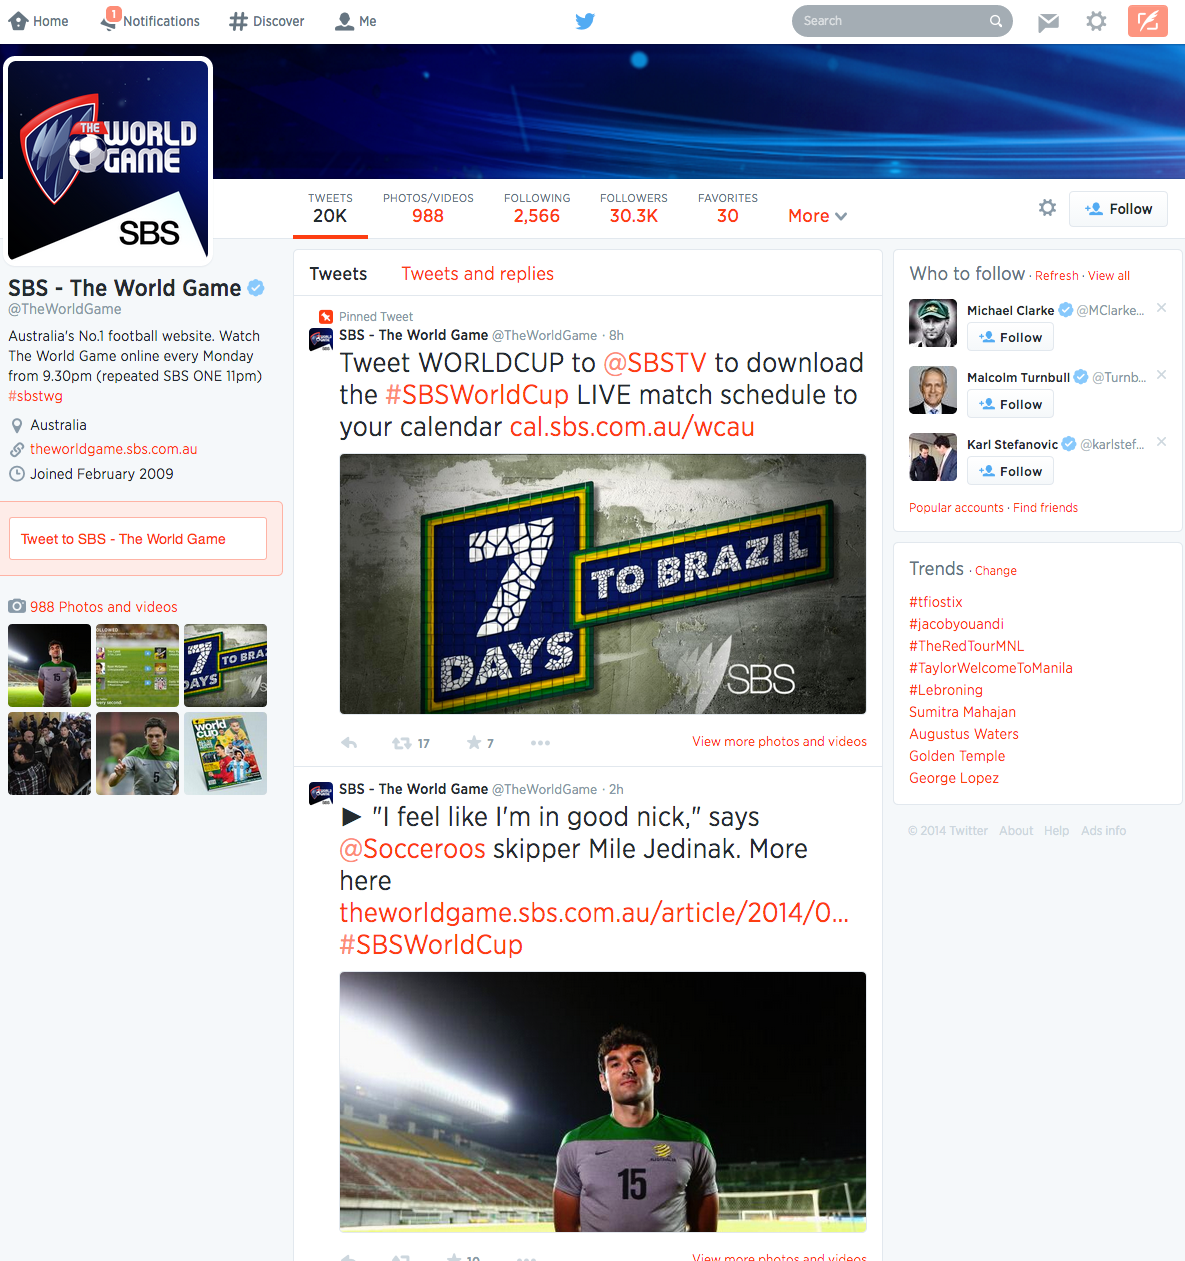 Screenshot_6_06_2014_4_15_pm 2.png